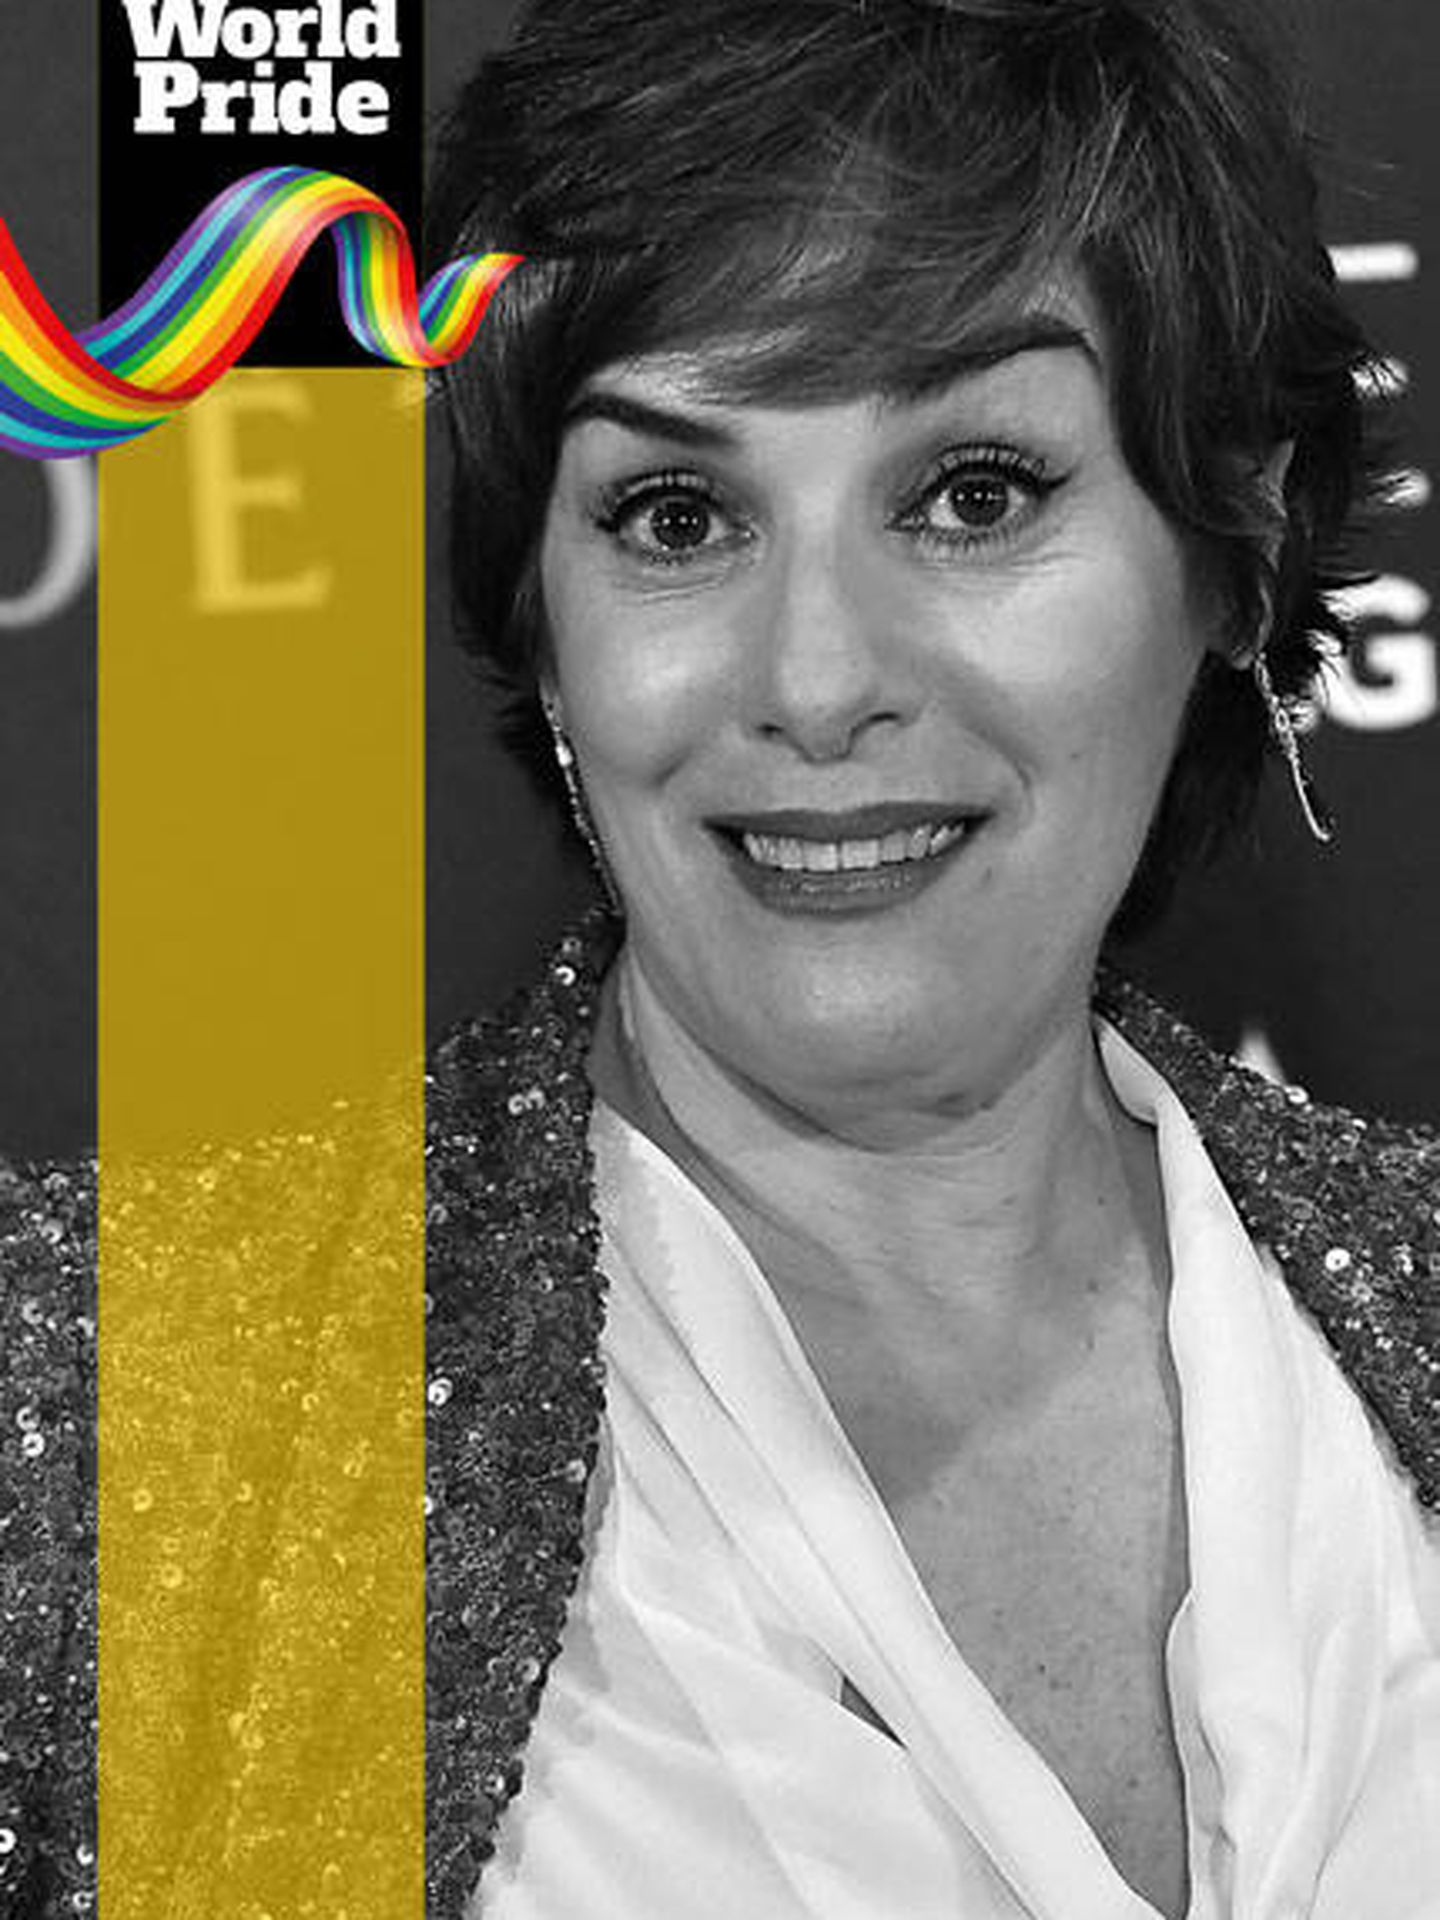 Orgullo LGTBI 2017: Anabel Alonso.